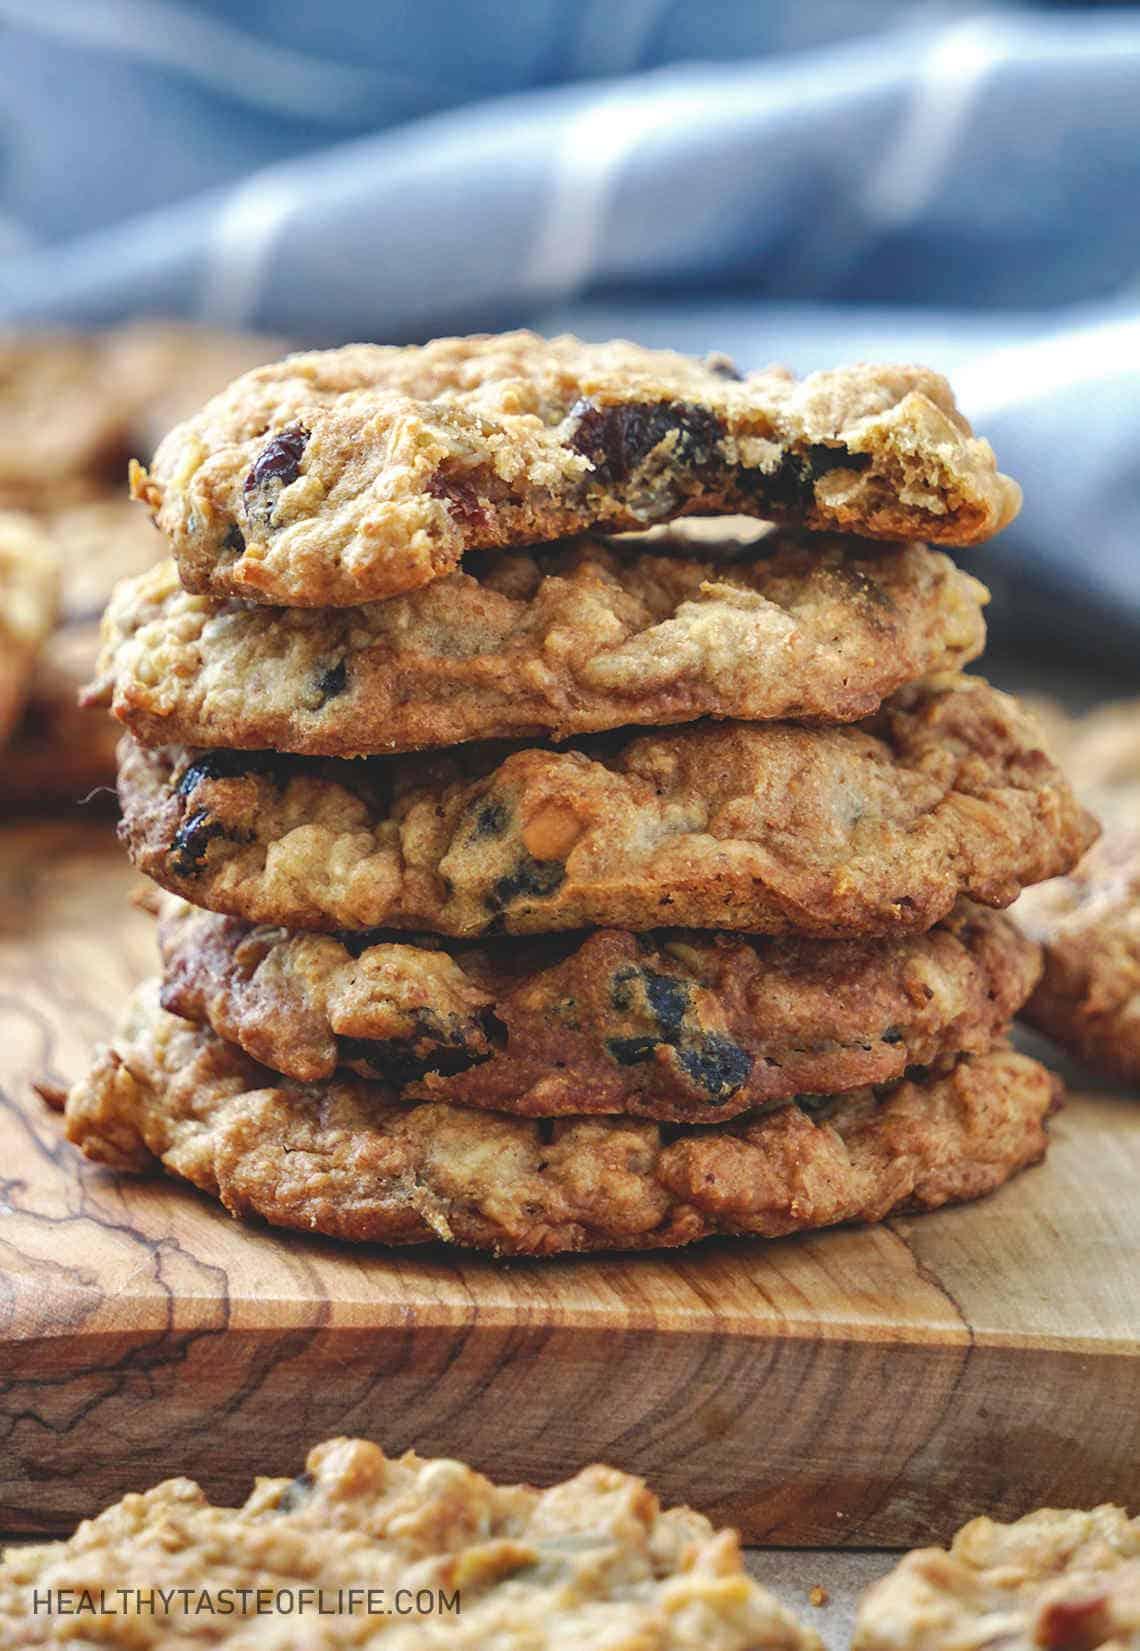 Healthy Vegan Oatmeal Cookies (Gluten Free) stacked.